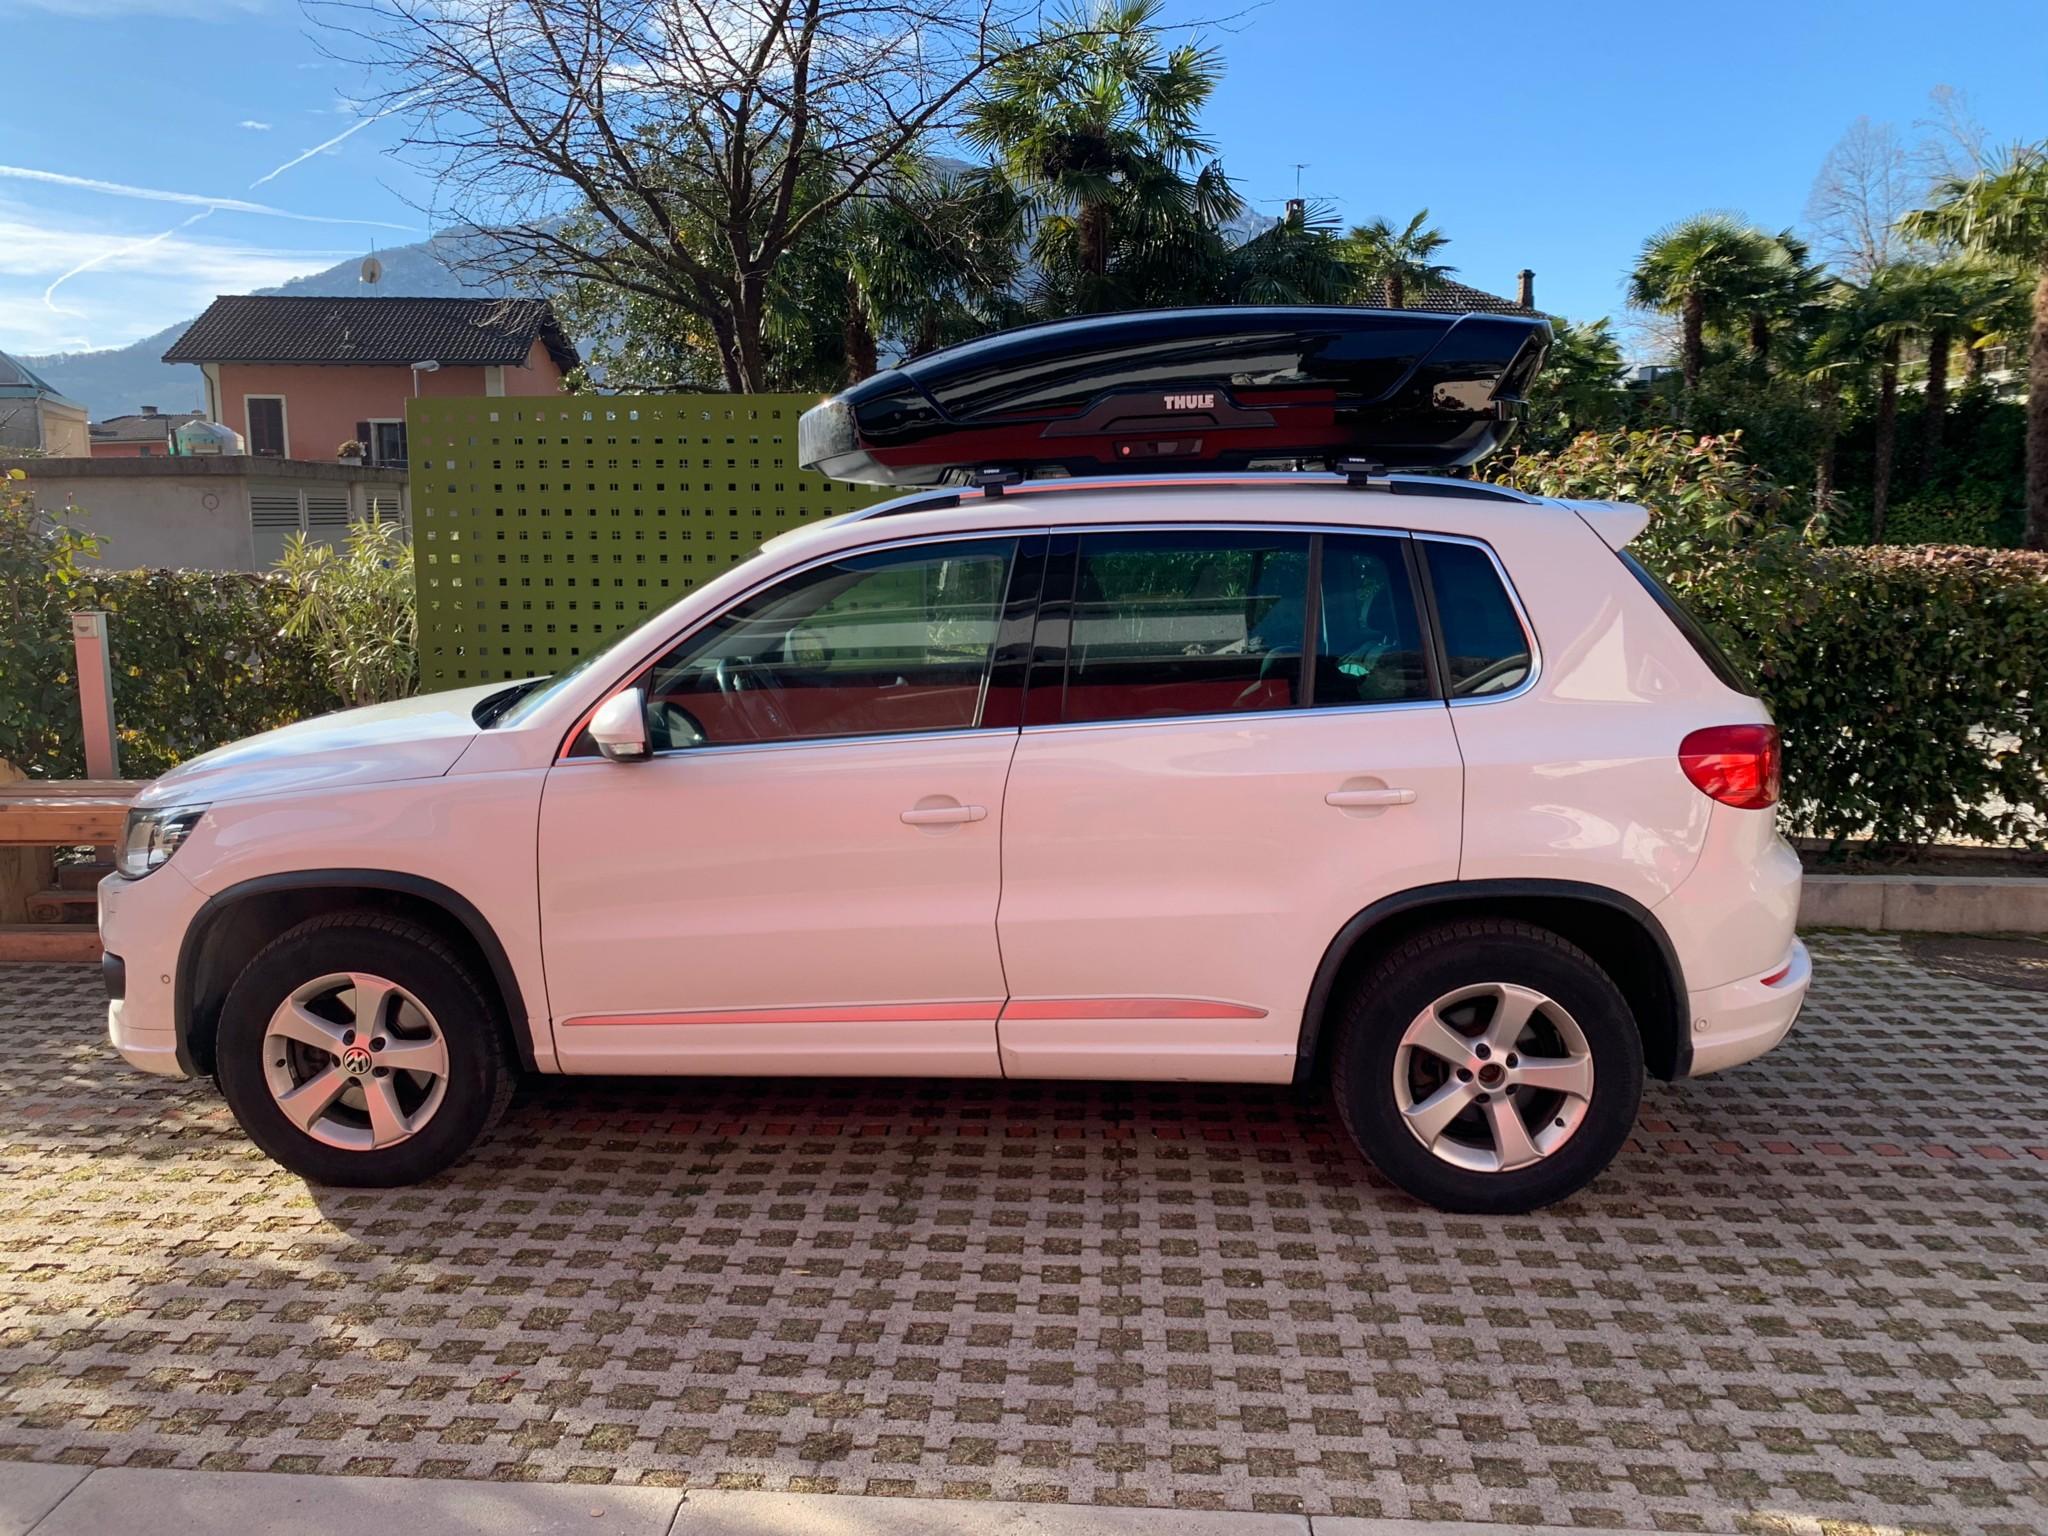 suv VW Tiguan WV Tiguan Rline 2015